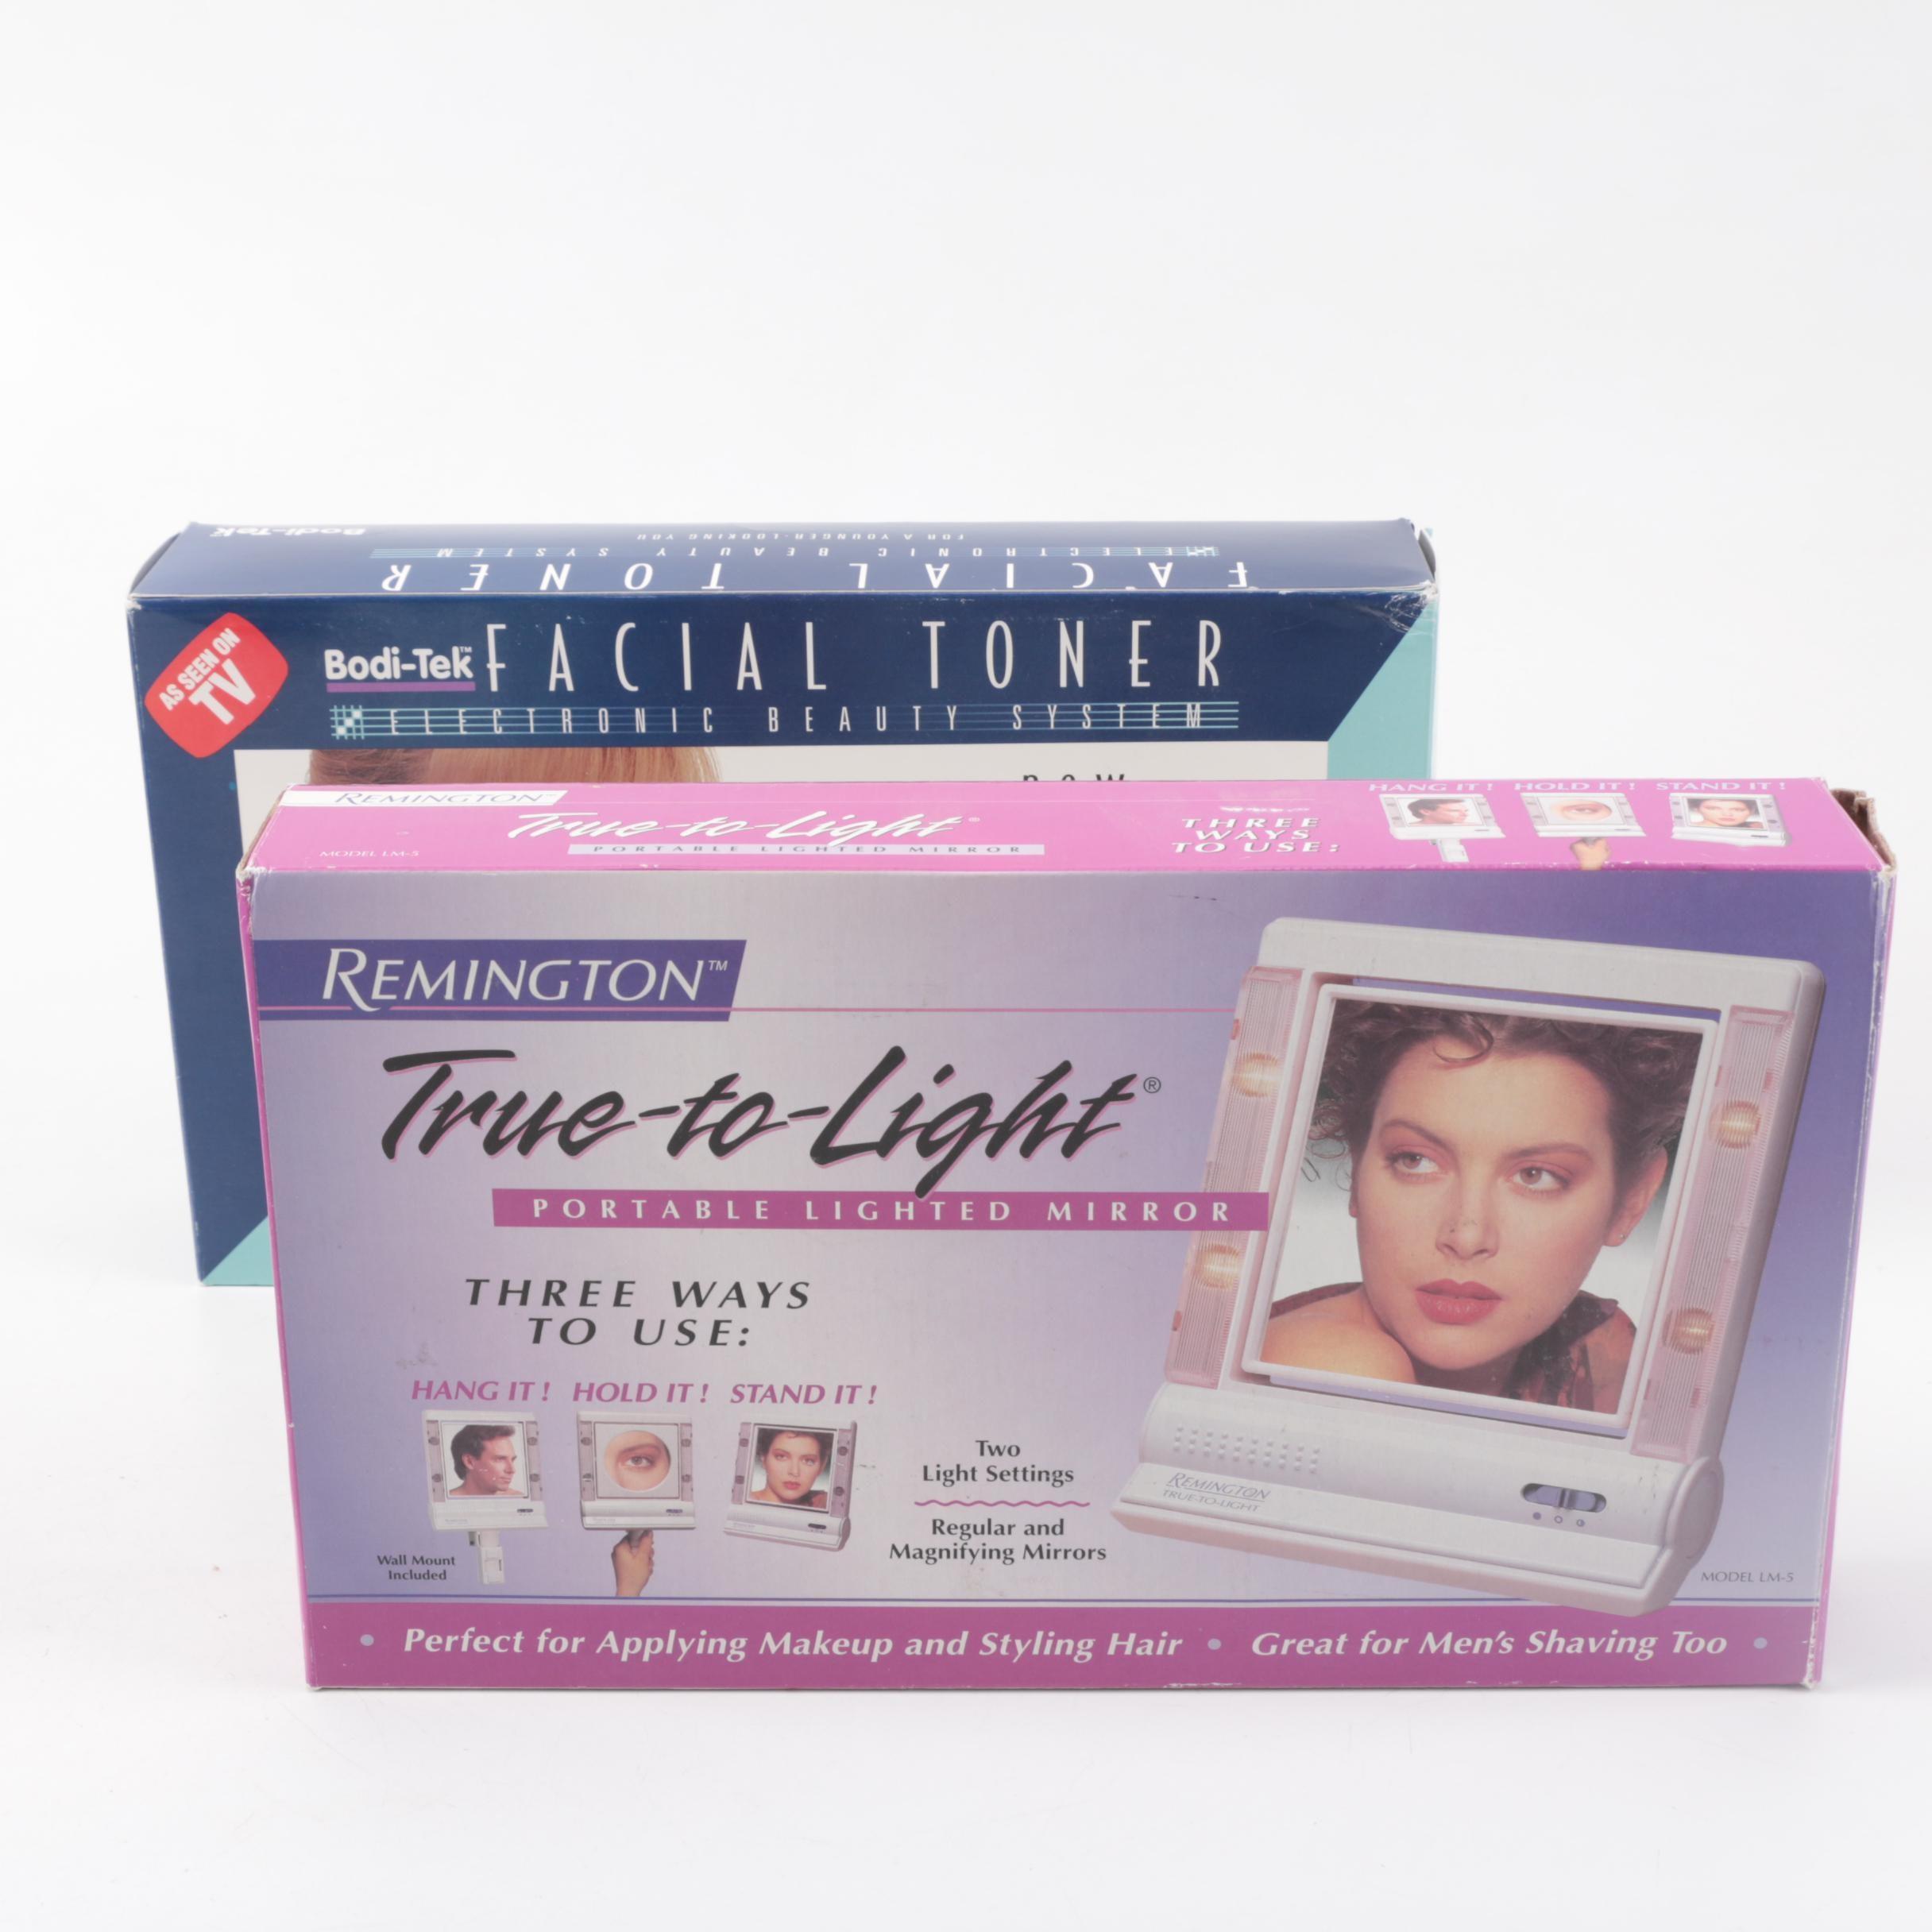 Remington True-To-Light Mirror and Bodi-Tek Facial Toner System